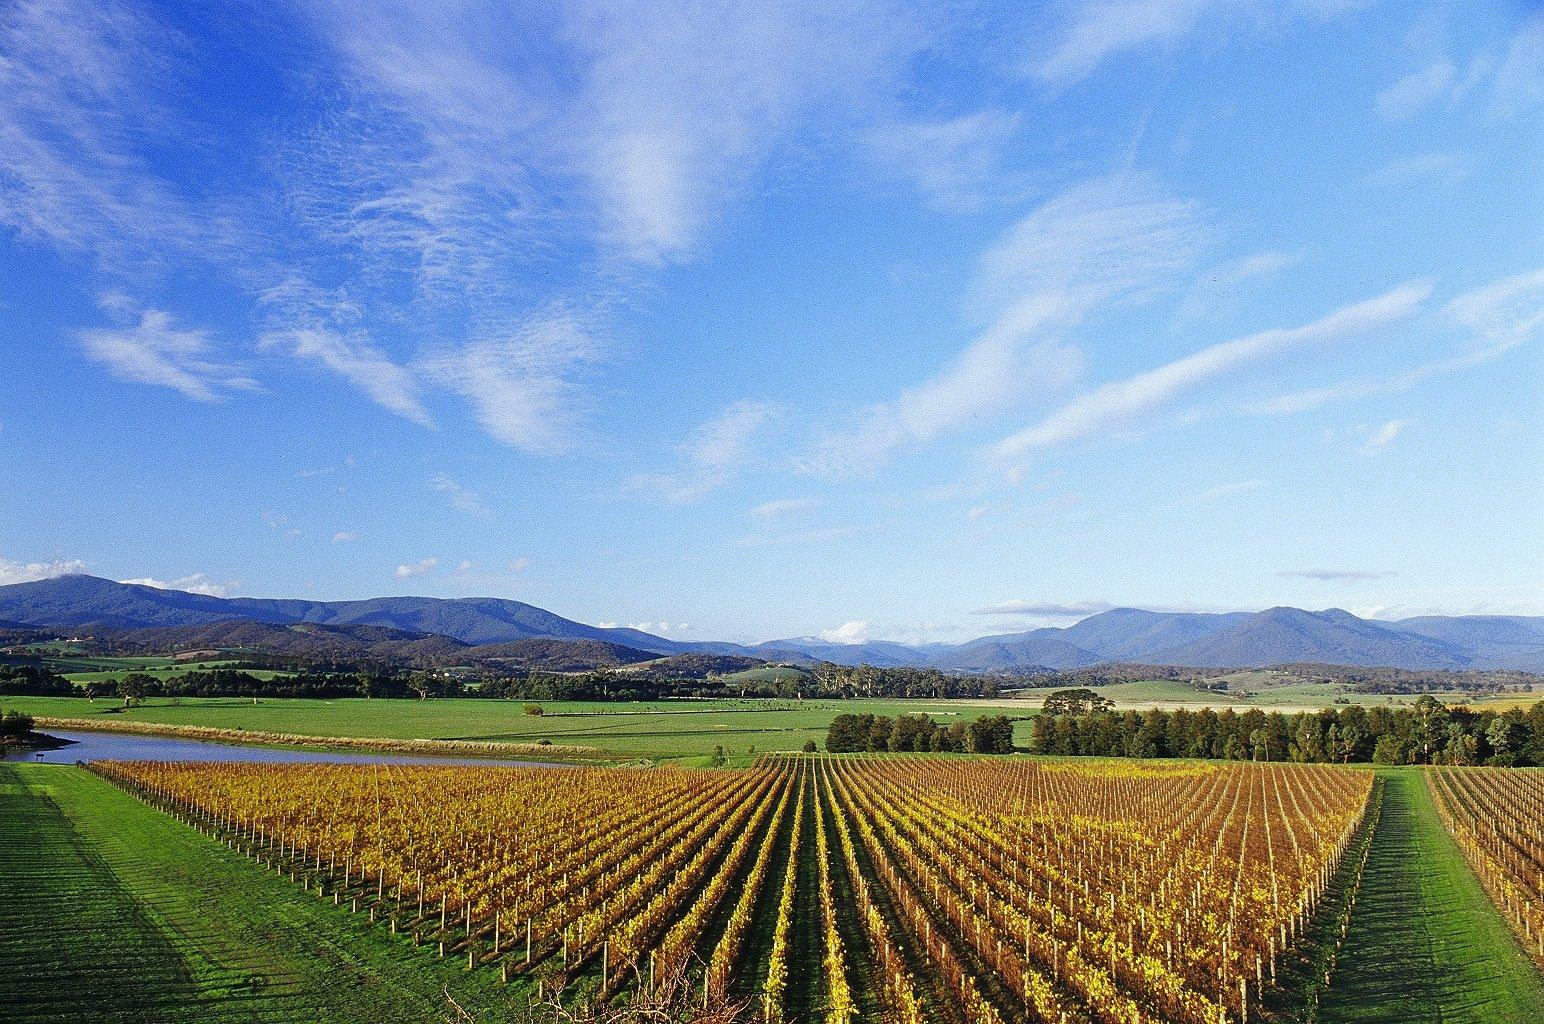 Domaine Chandon-vineyard of the Domaine Chandon winery